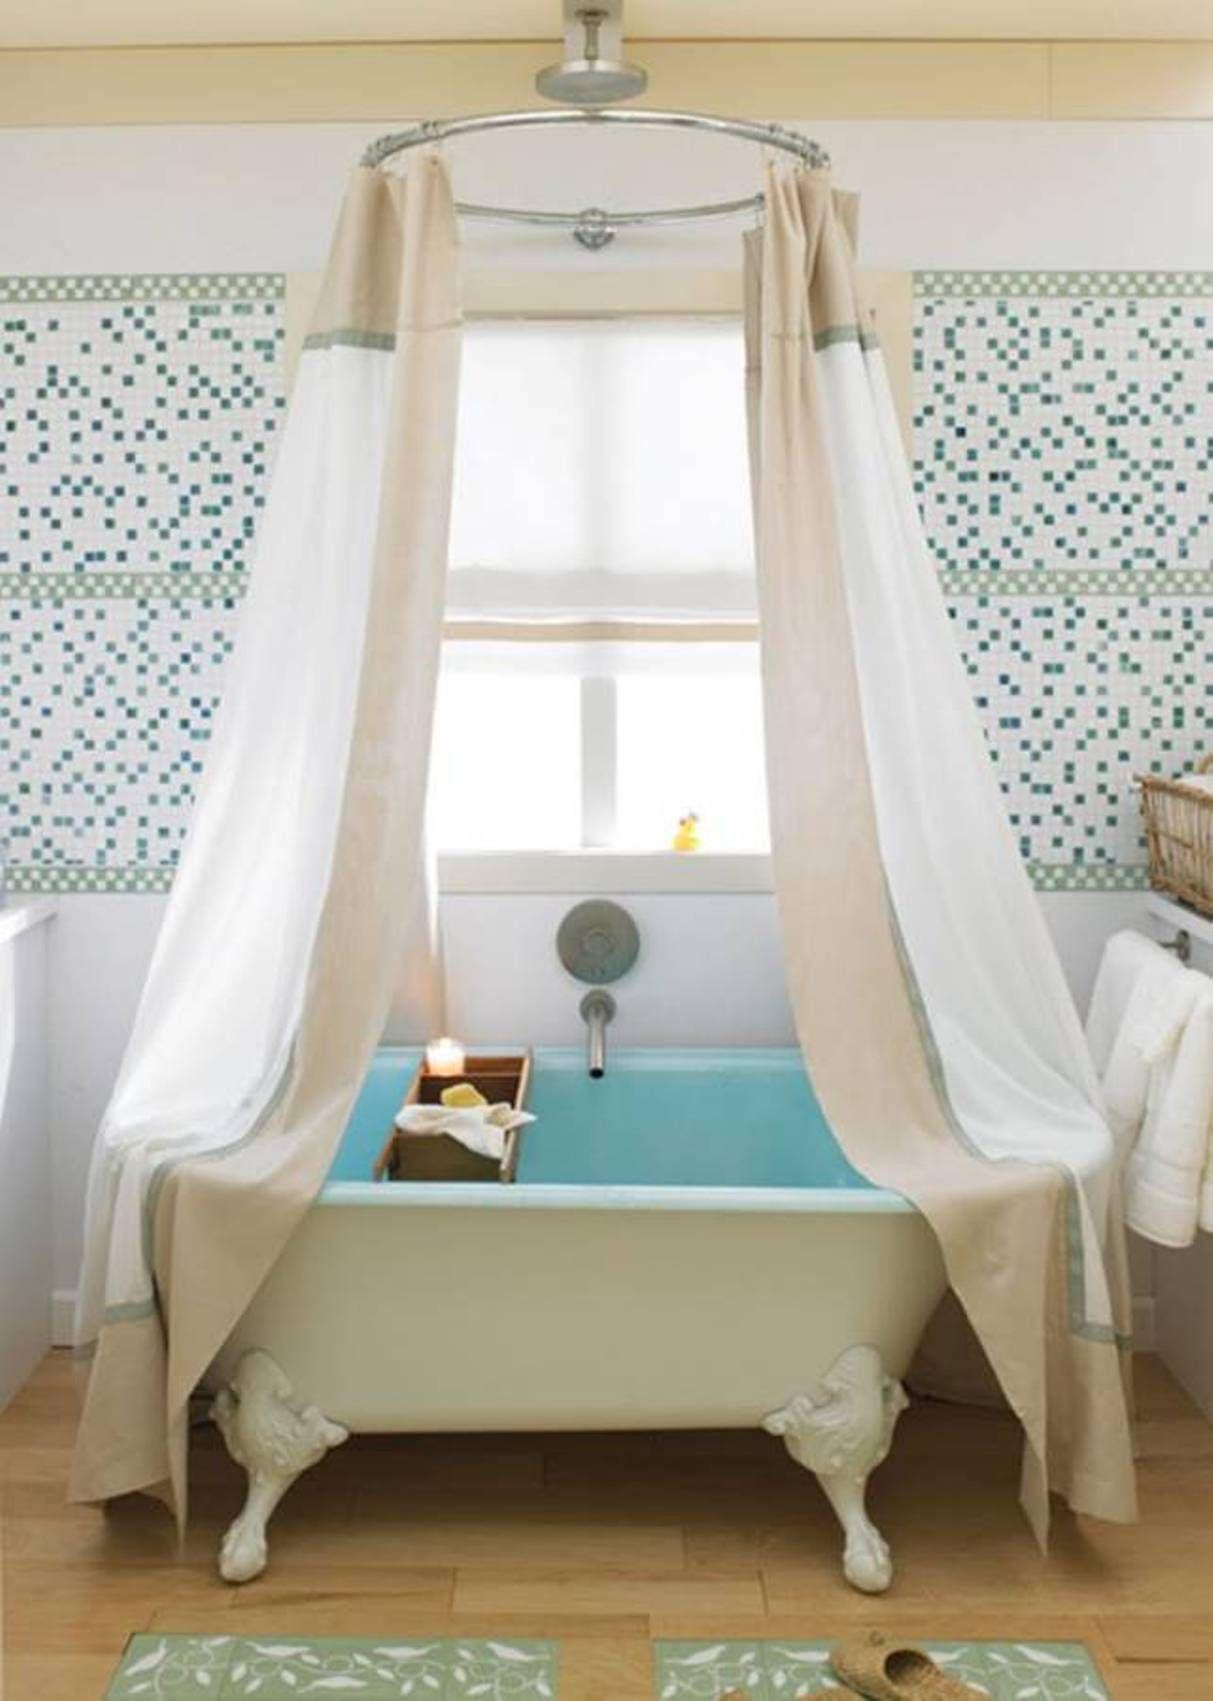 Bathroom , Bathroom Claw Foot Tubs : White Claw Foot Tubs With ...